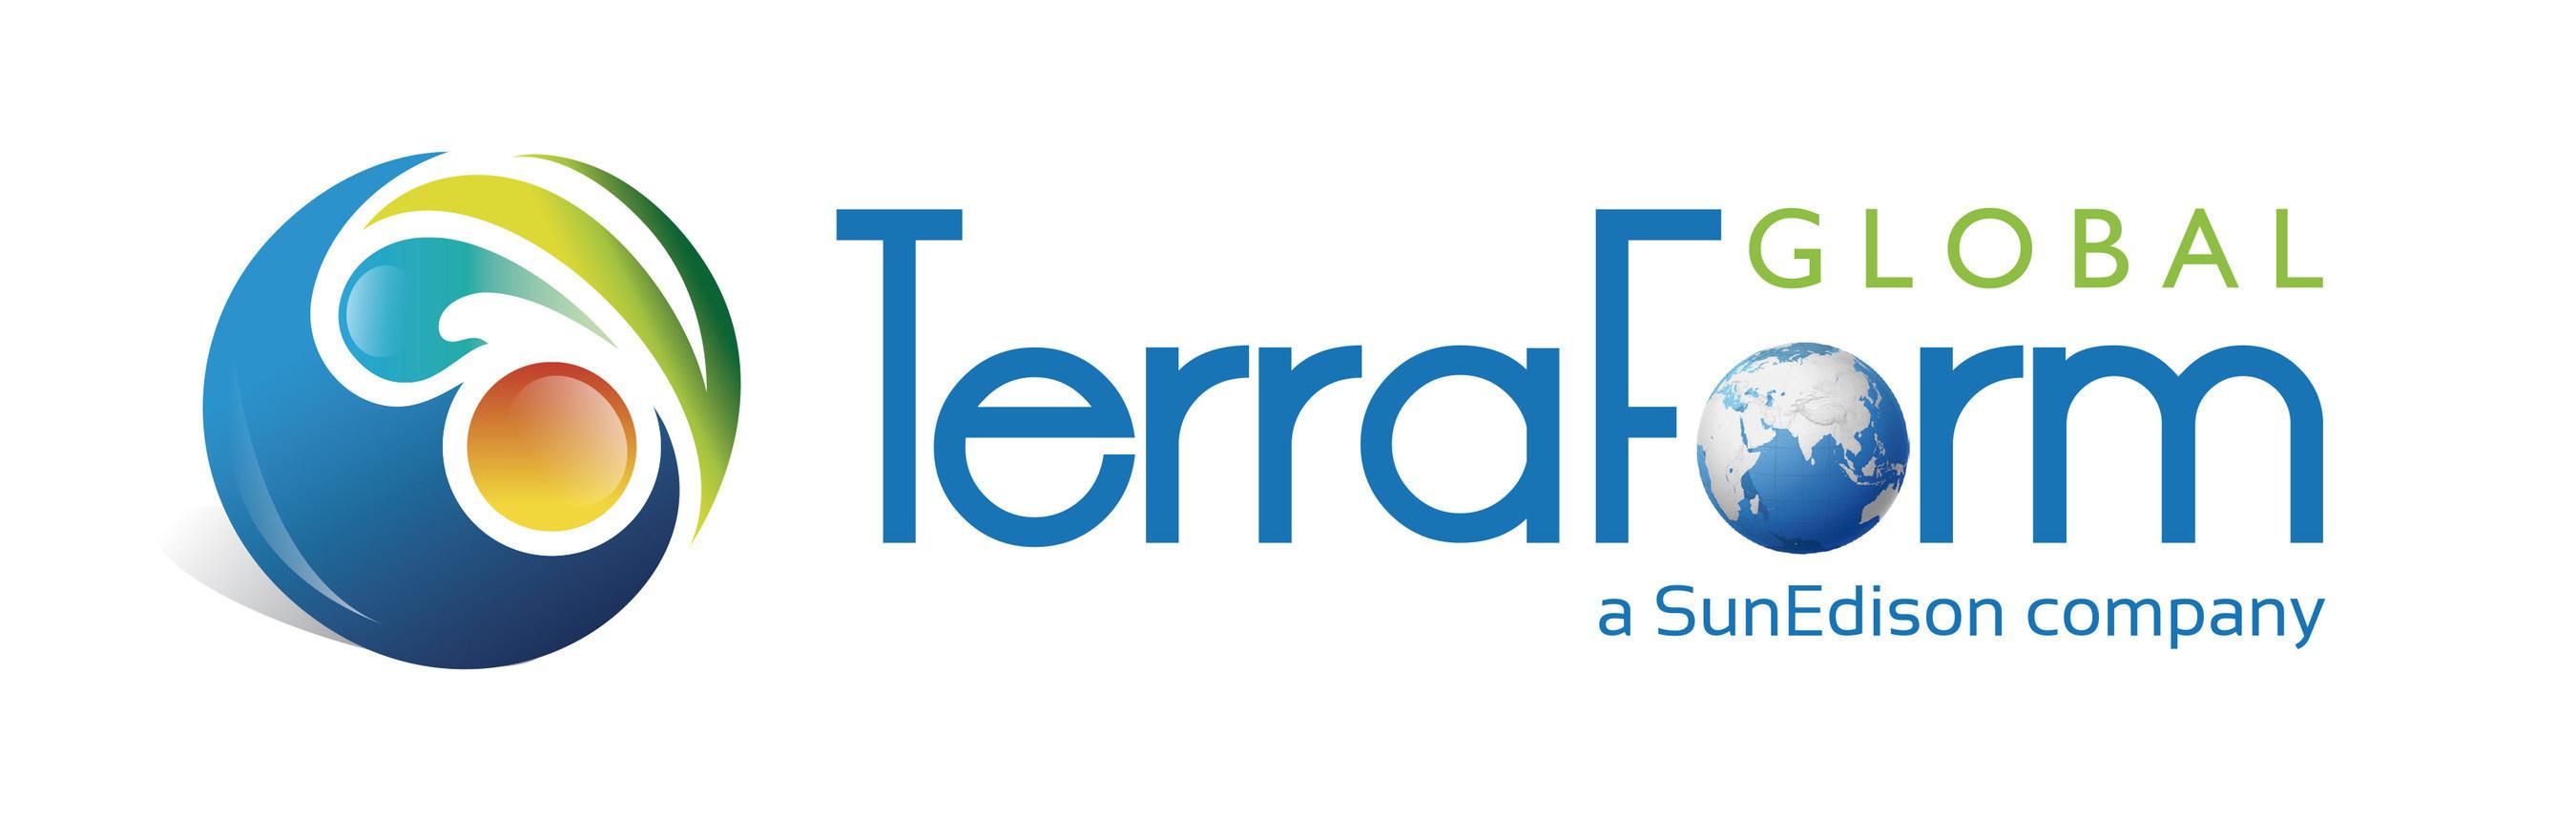 TerraForm Global, Inc. Logo